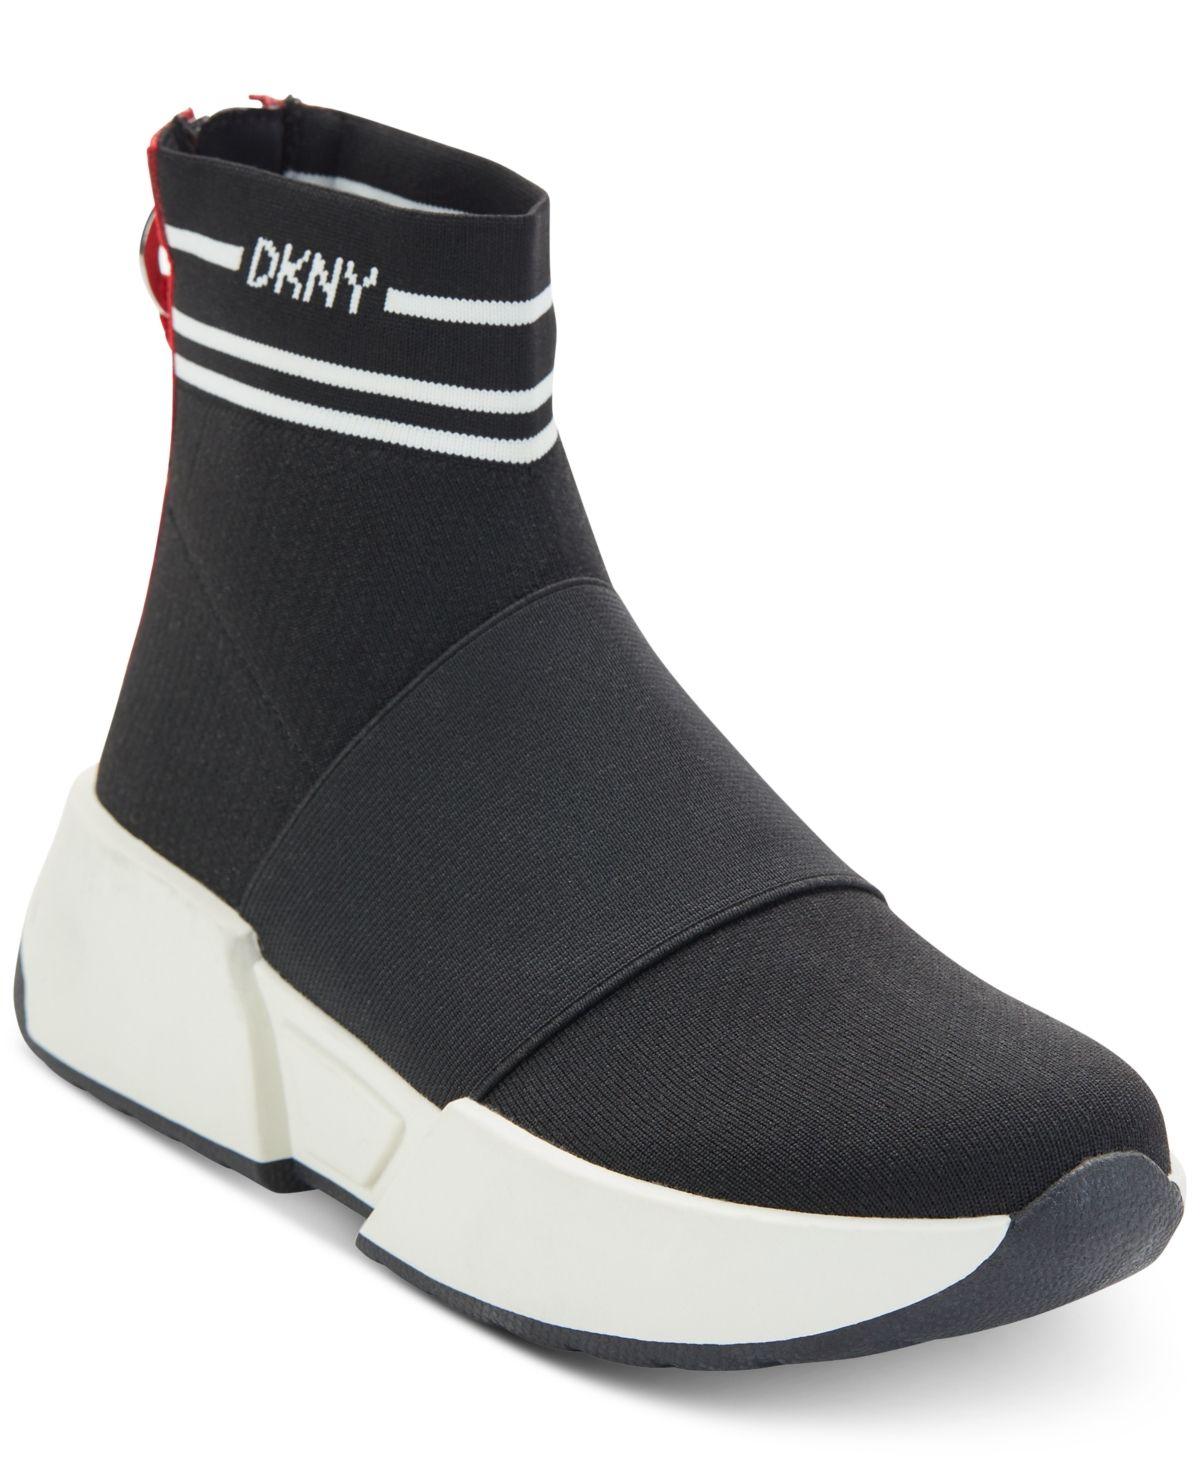 Dkny Marini Sneakers, Created For Macy's White Black